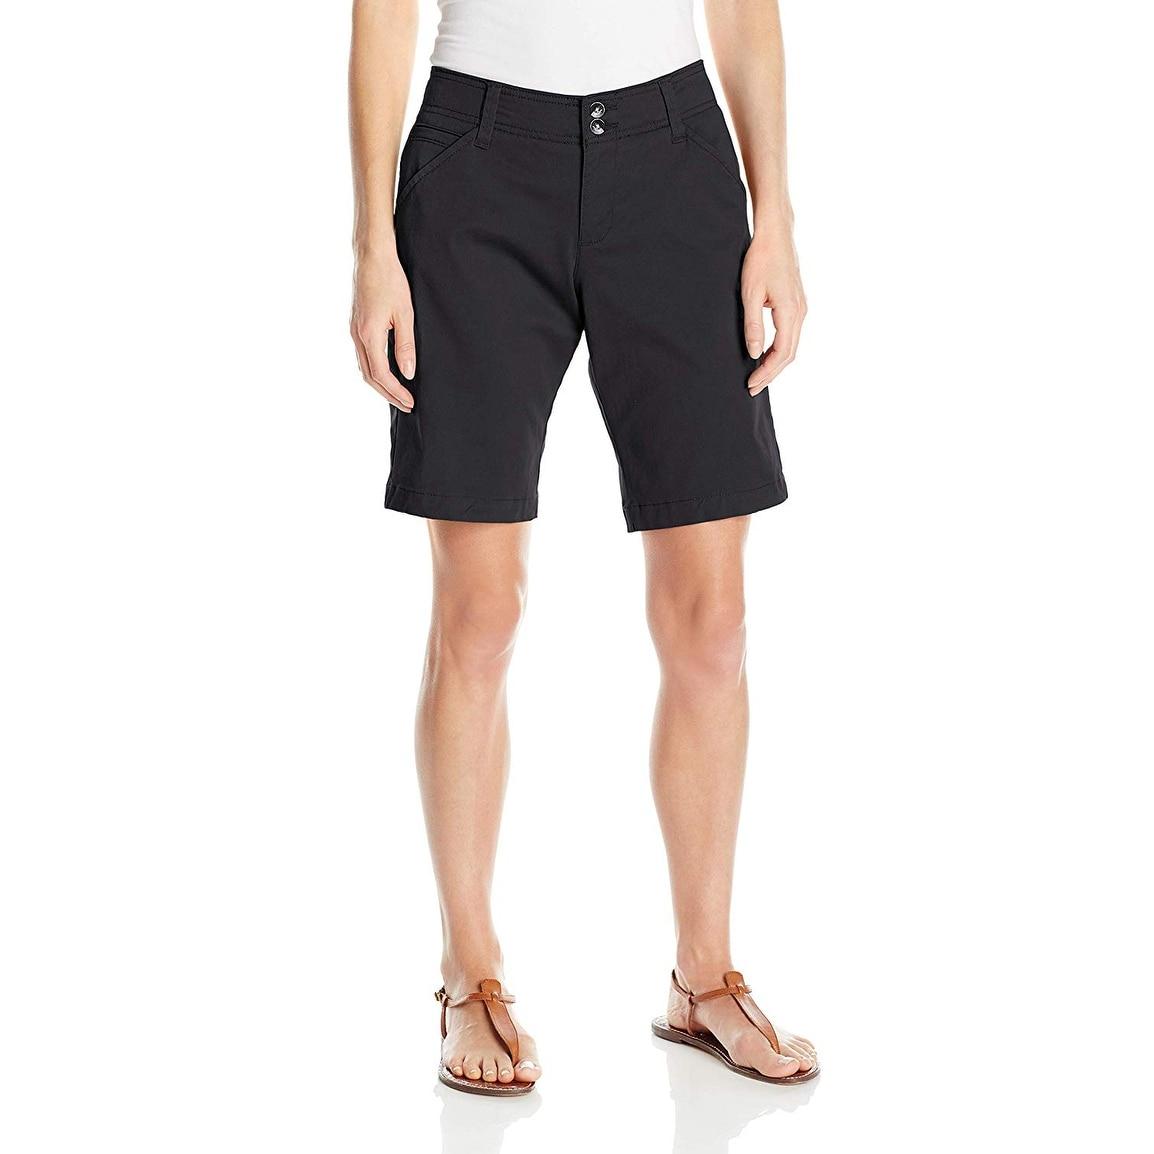 3dad7bc402 Lee Solid Black Womens Size 12 Midrise Fit Bermuda Walking Shorts